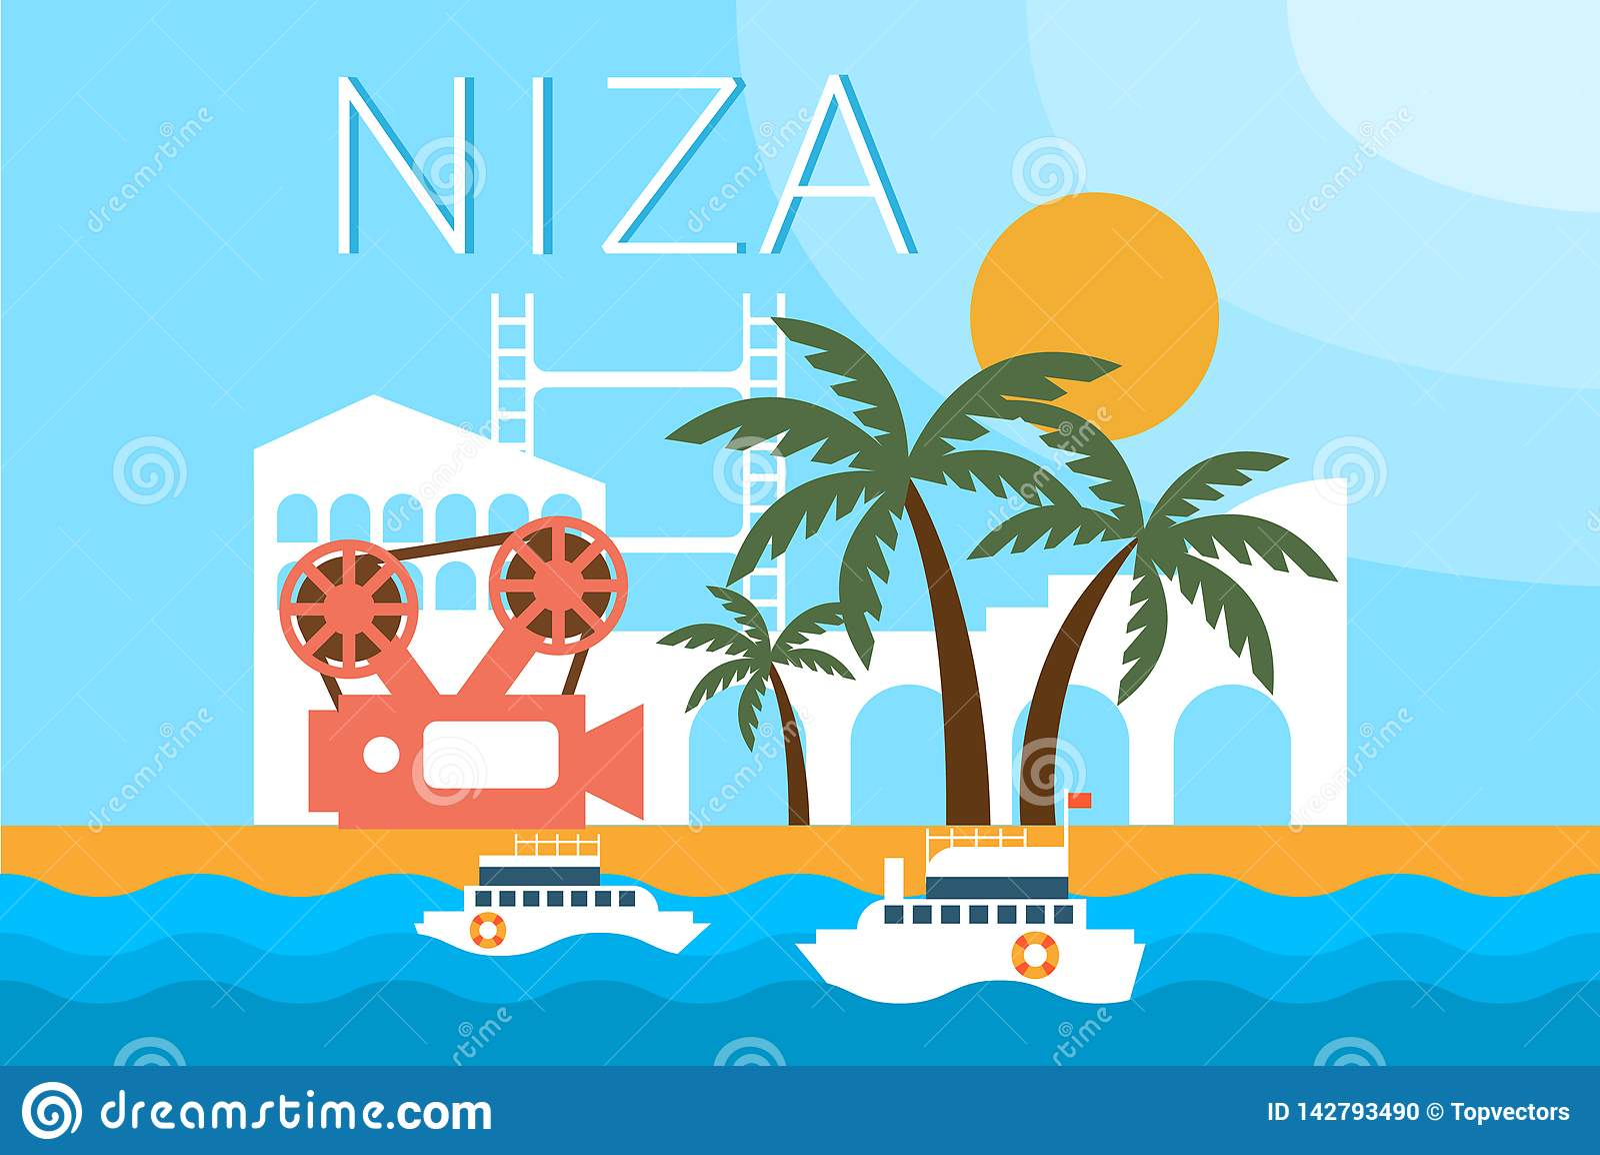 Niza, ορόσημα ταξιδιού, διανυσματική απεικόνιση αρχιτεκτονικής πόλεων σ